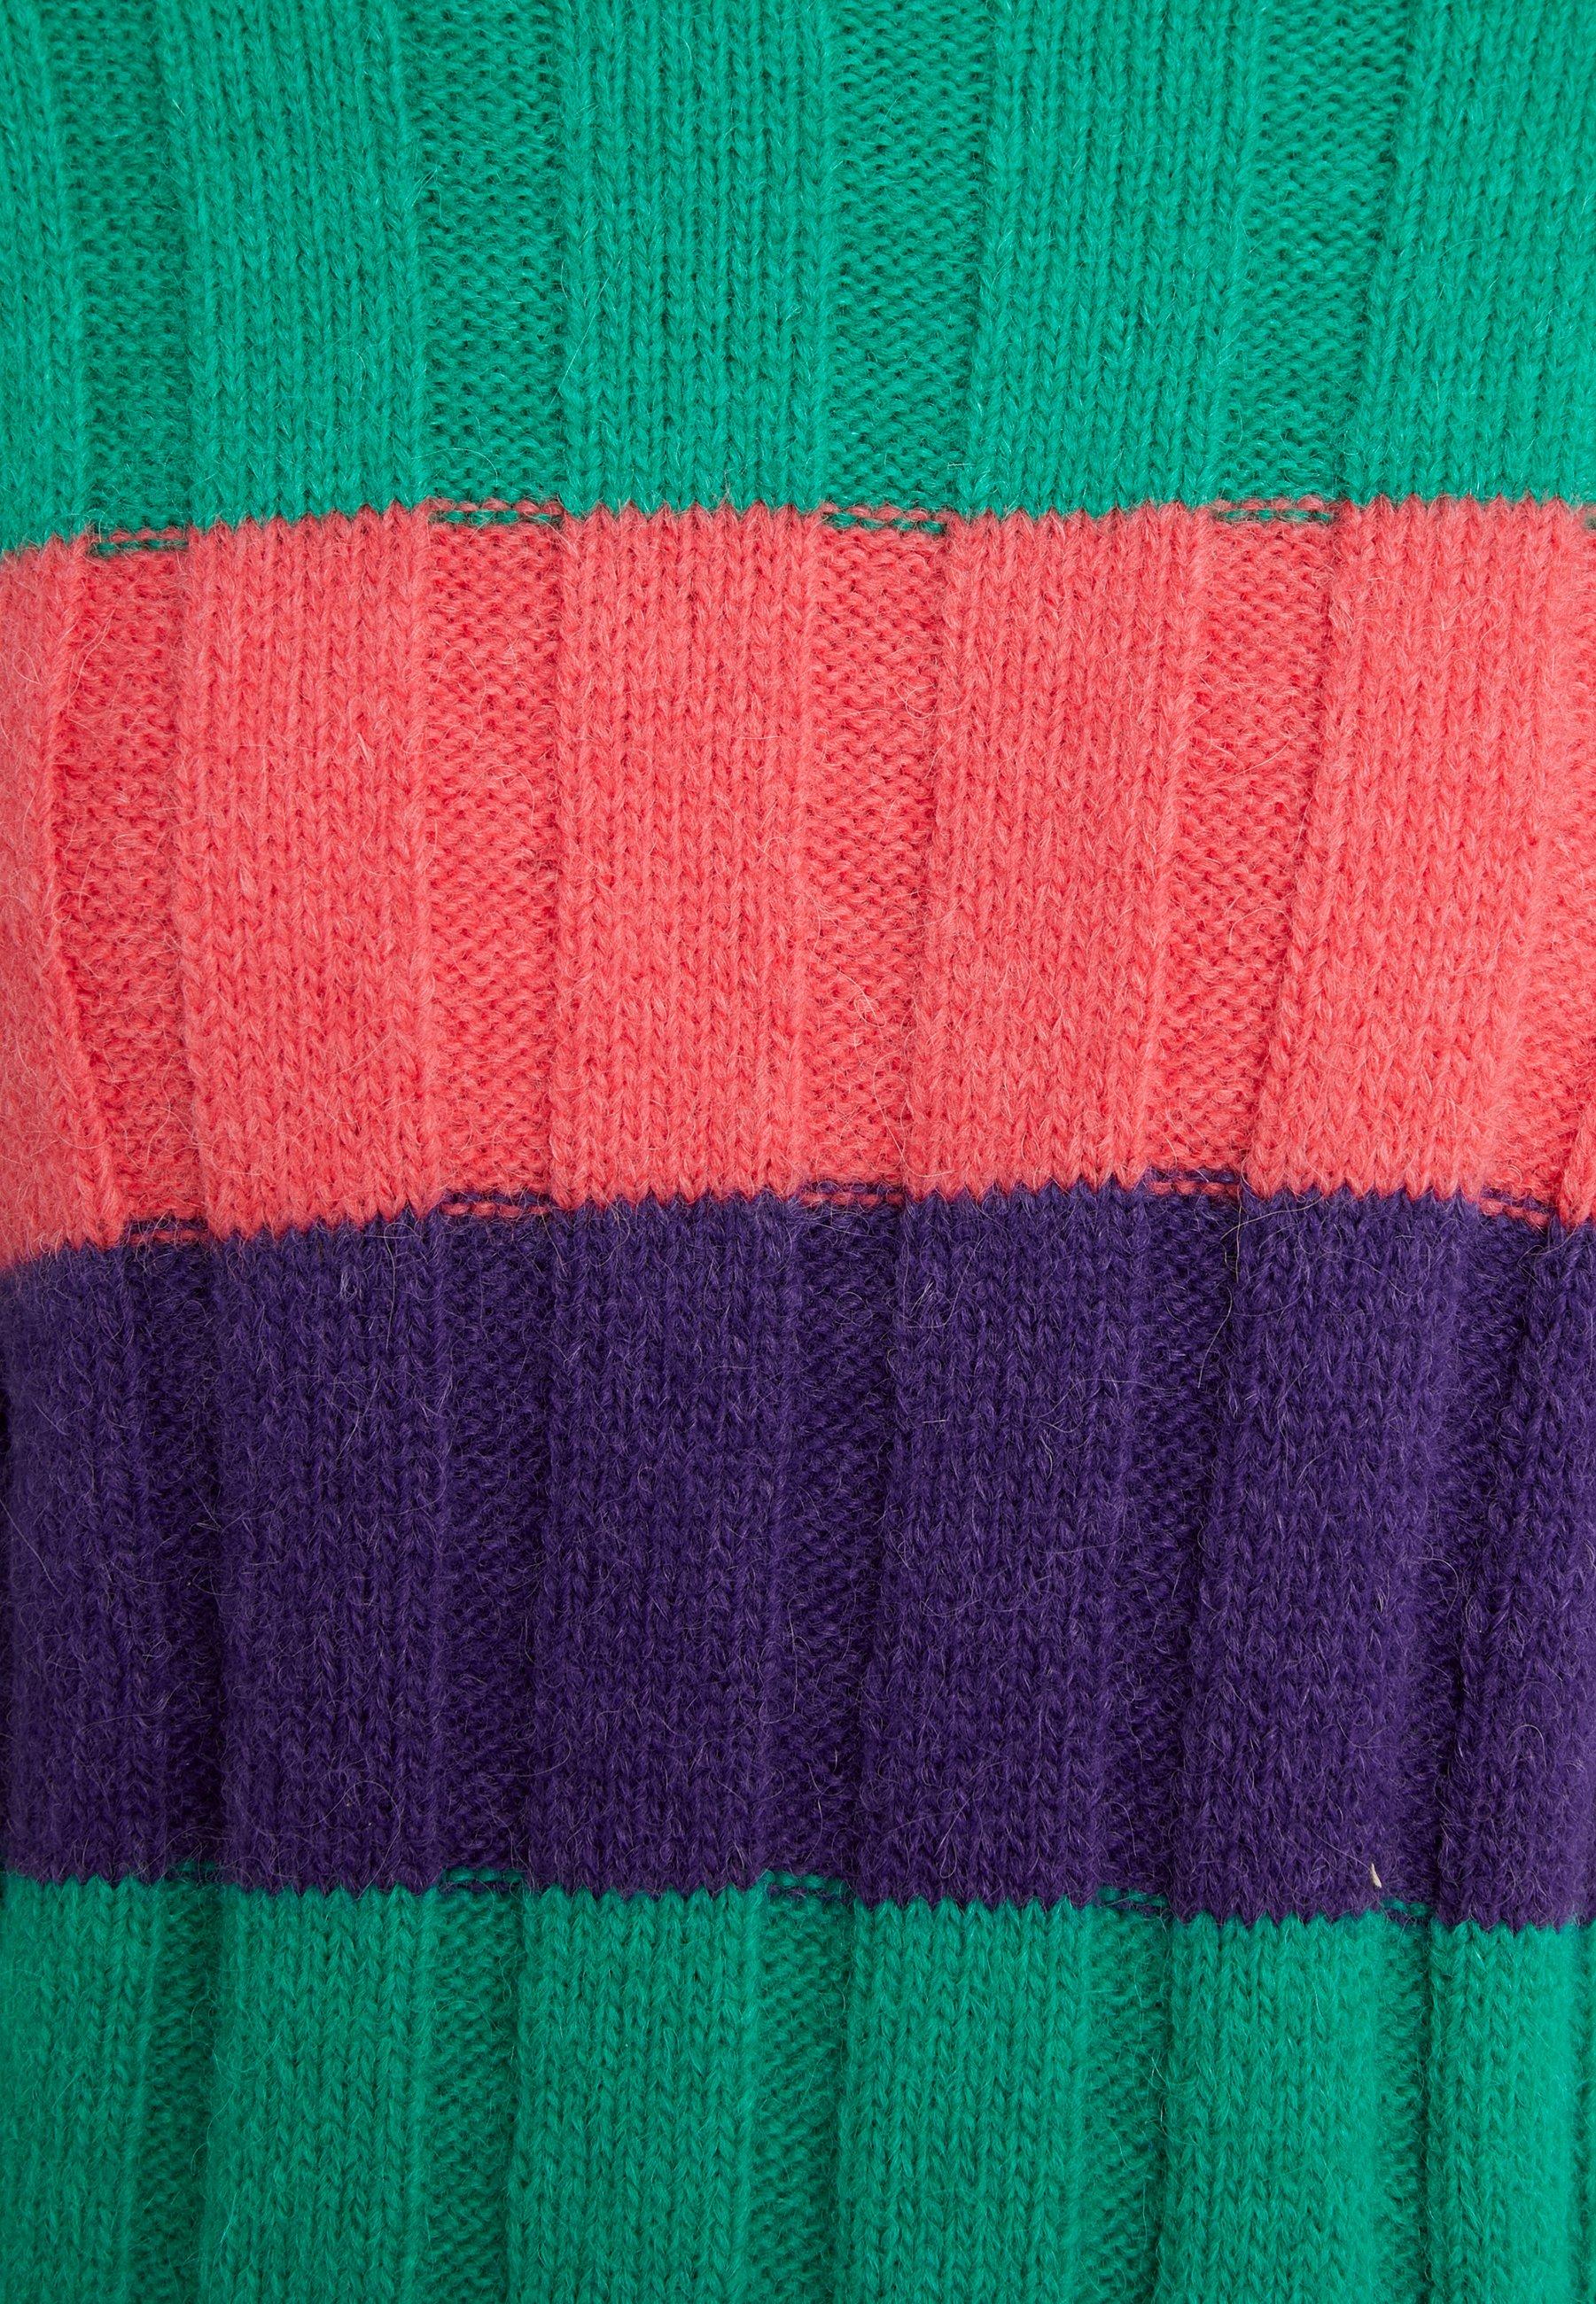 Strikpullover Striktrøjer multi color